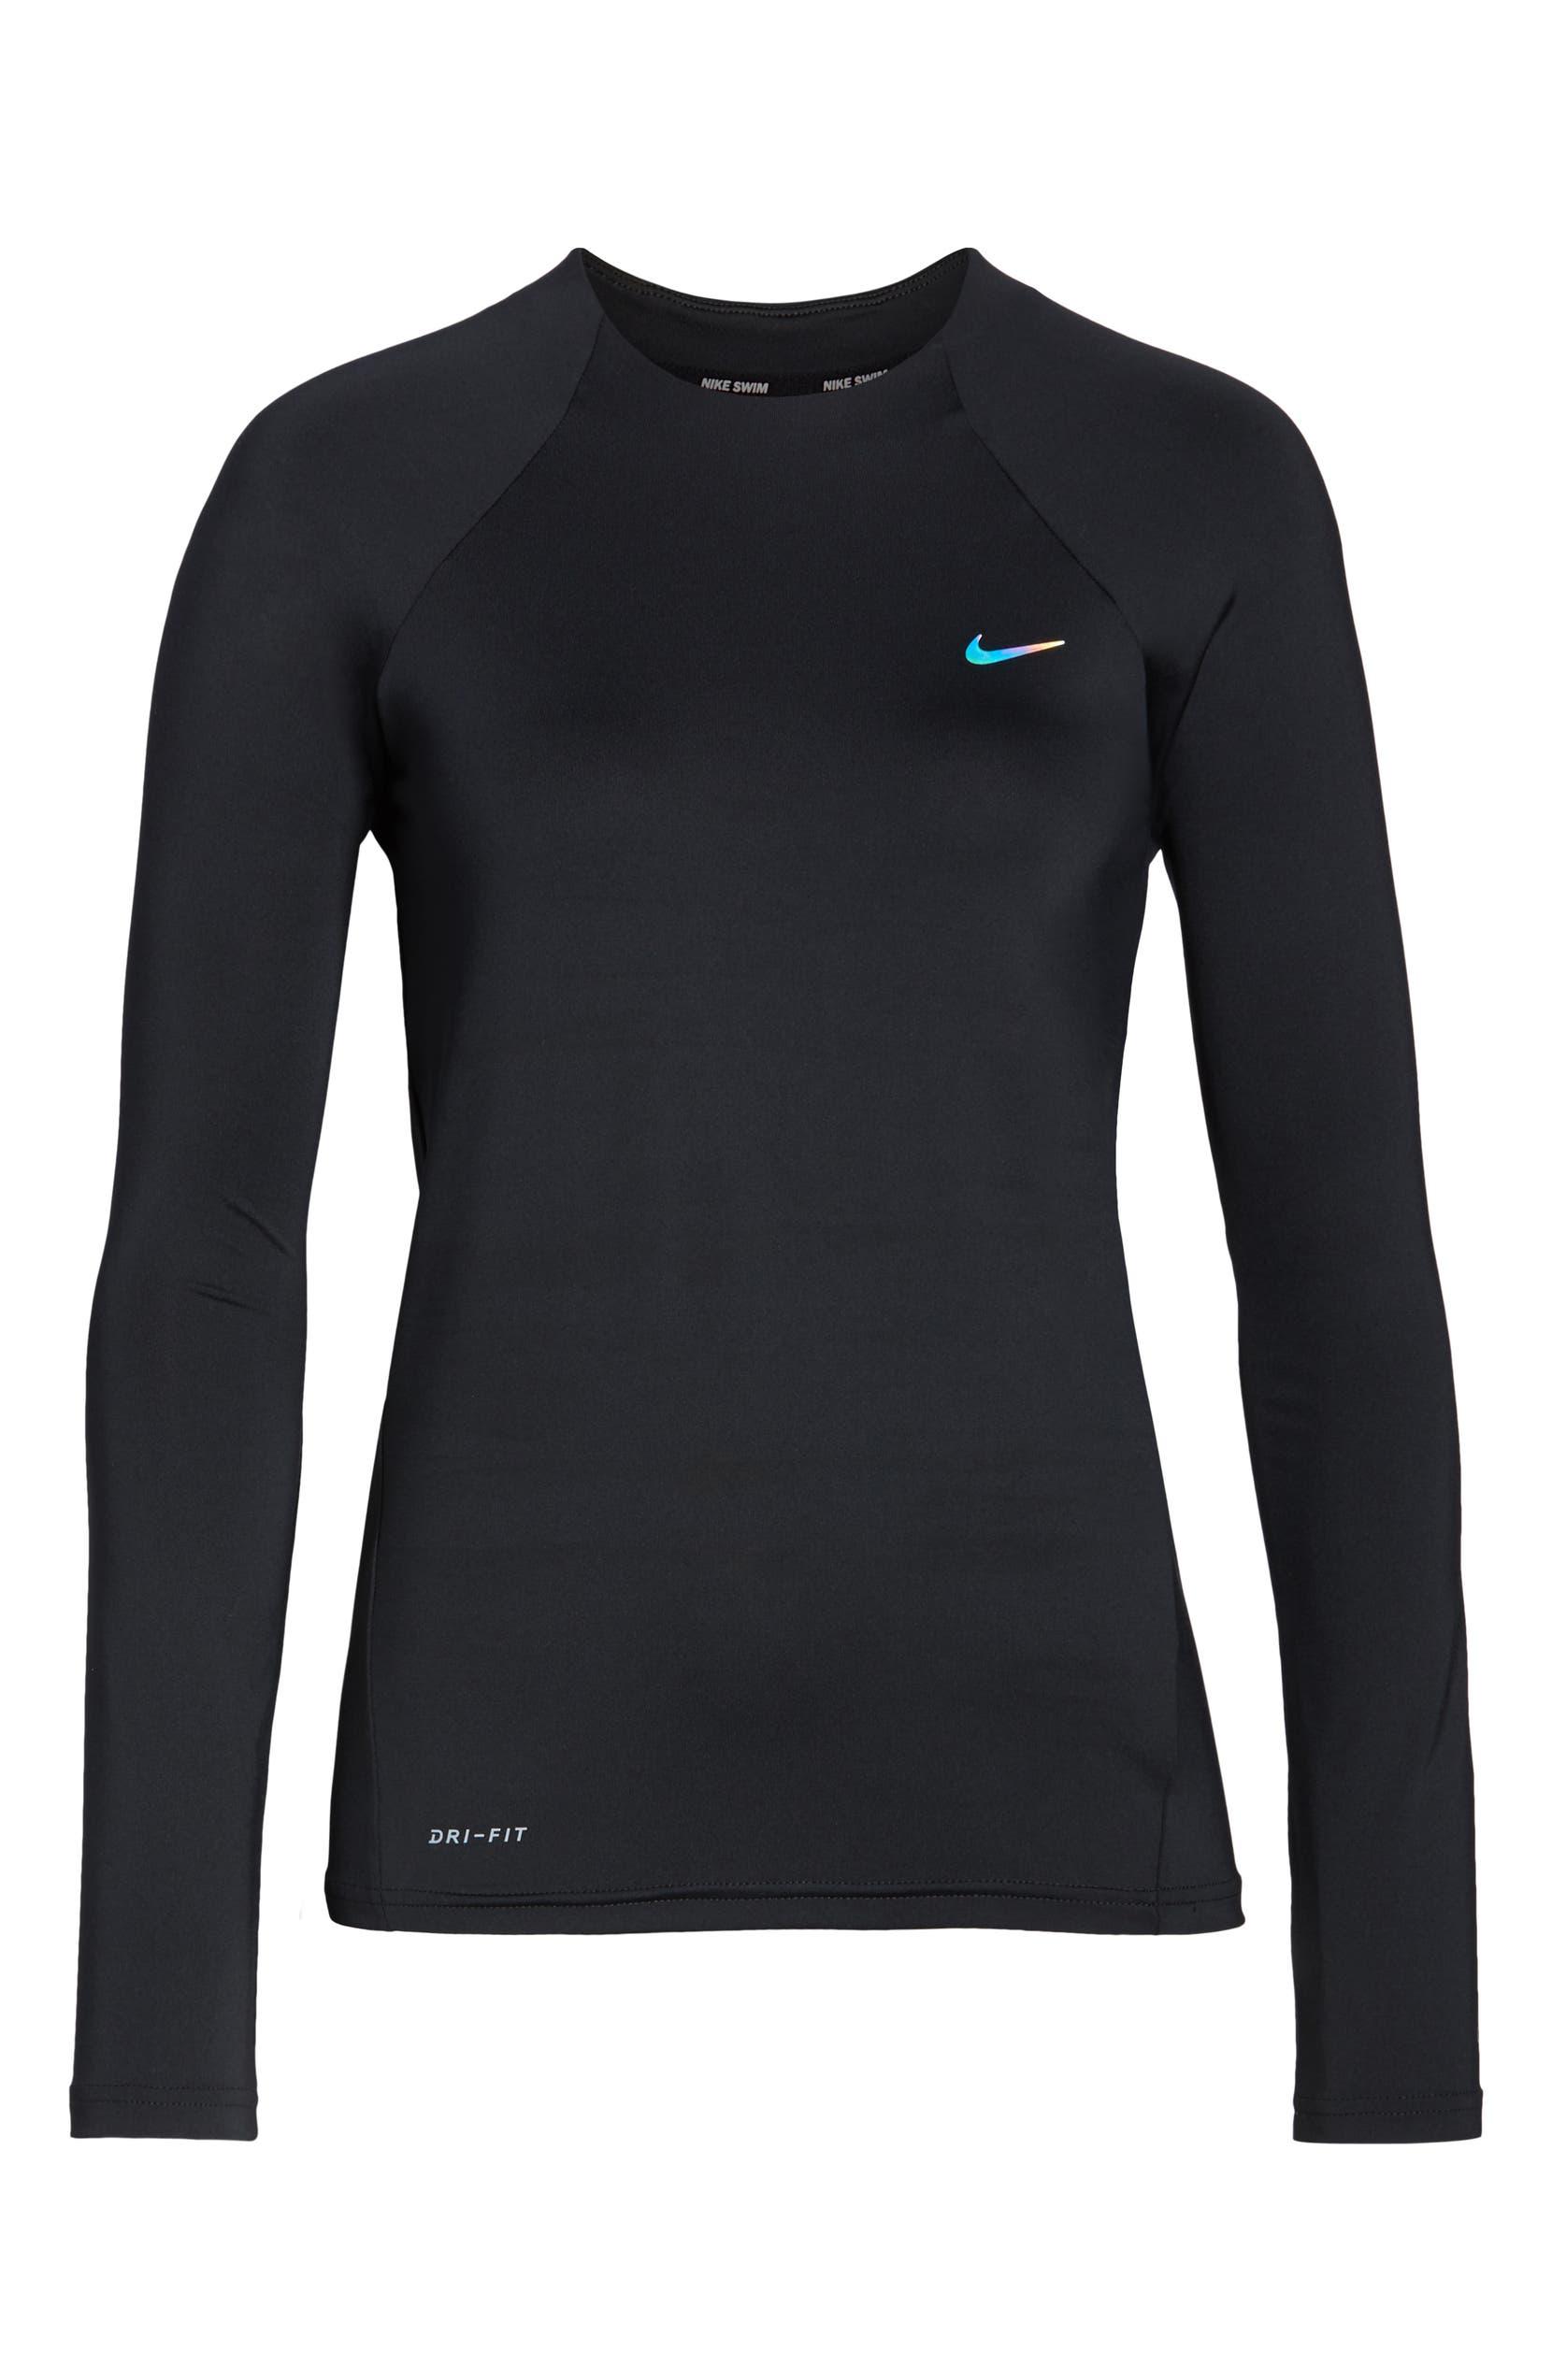 6427388fb Nike Long Sleeve Hydroguard Shirt   Nordstrom